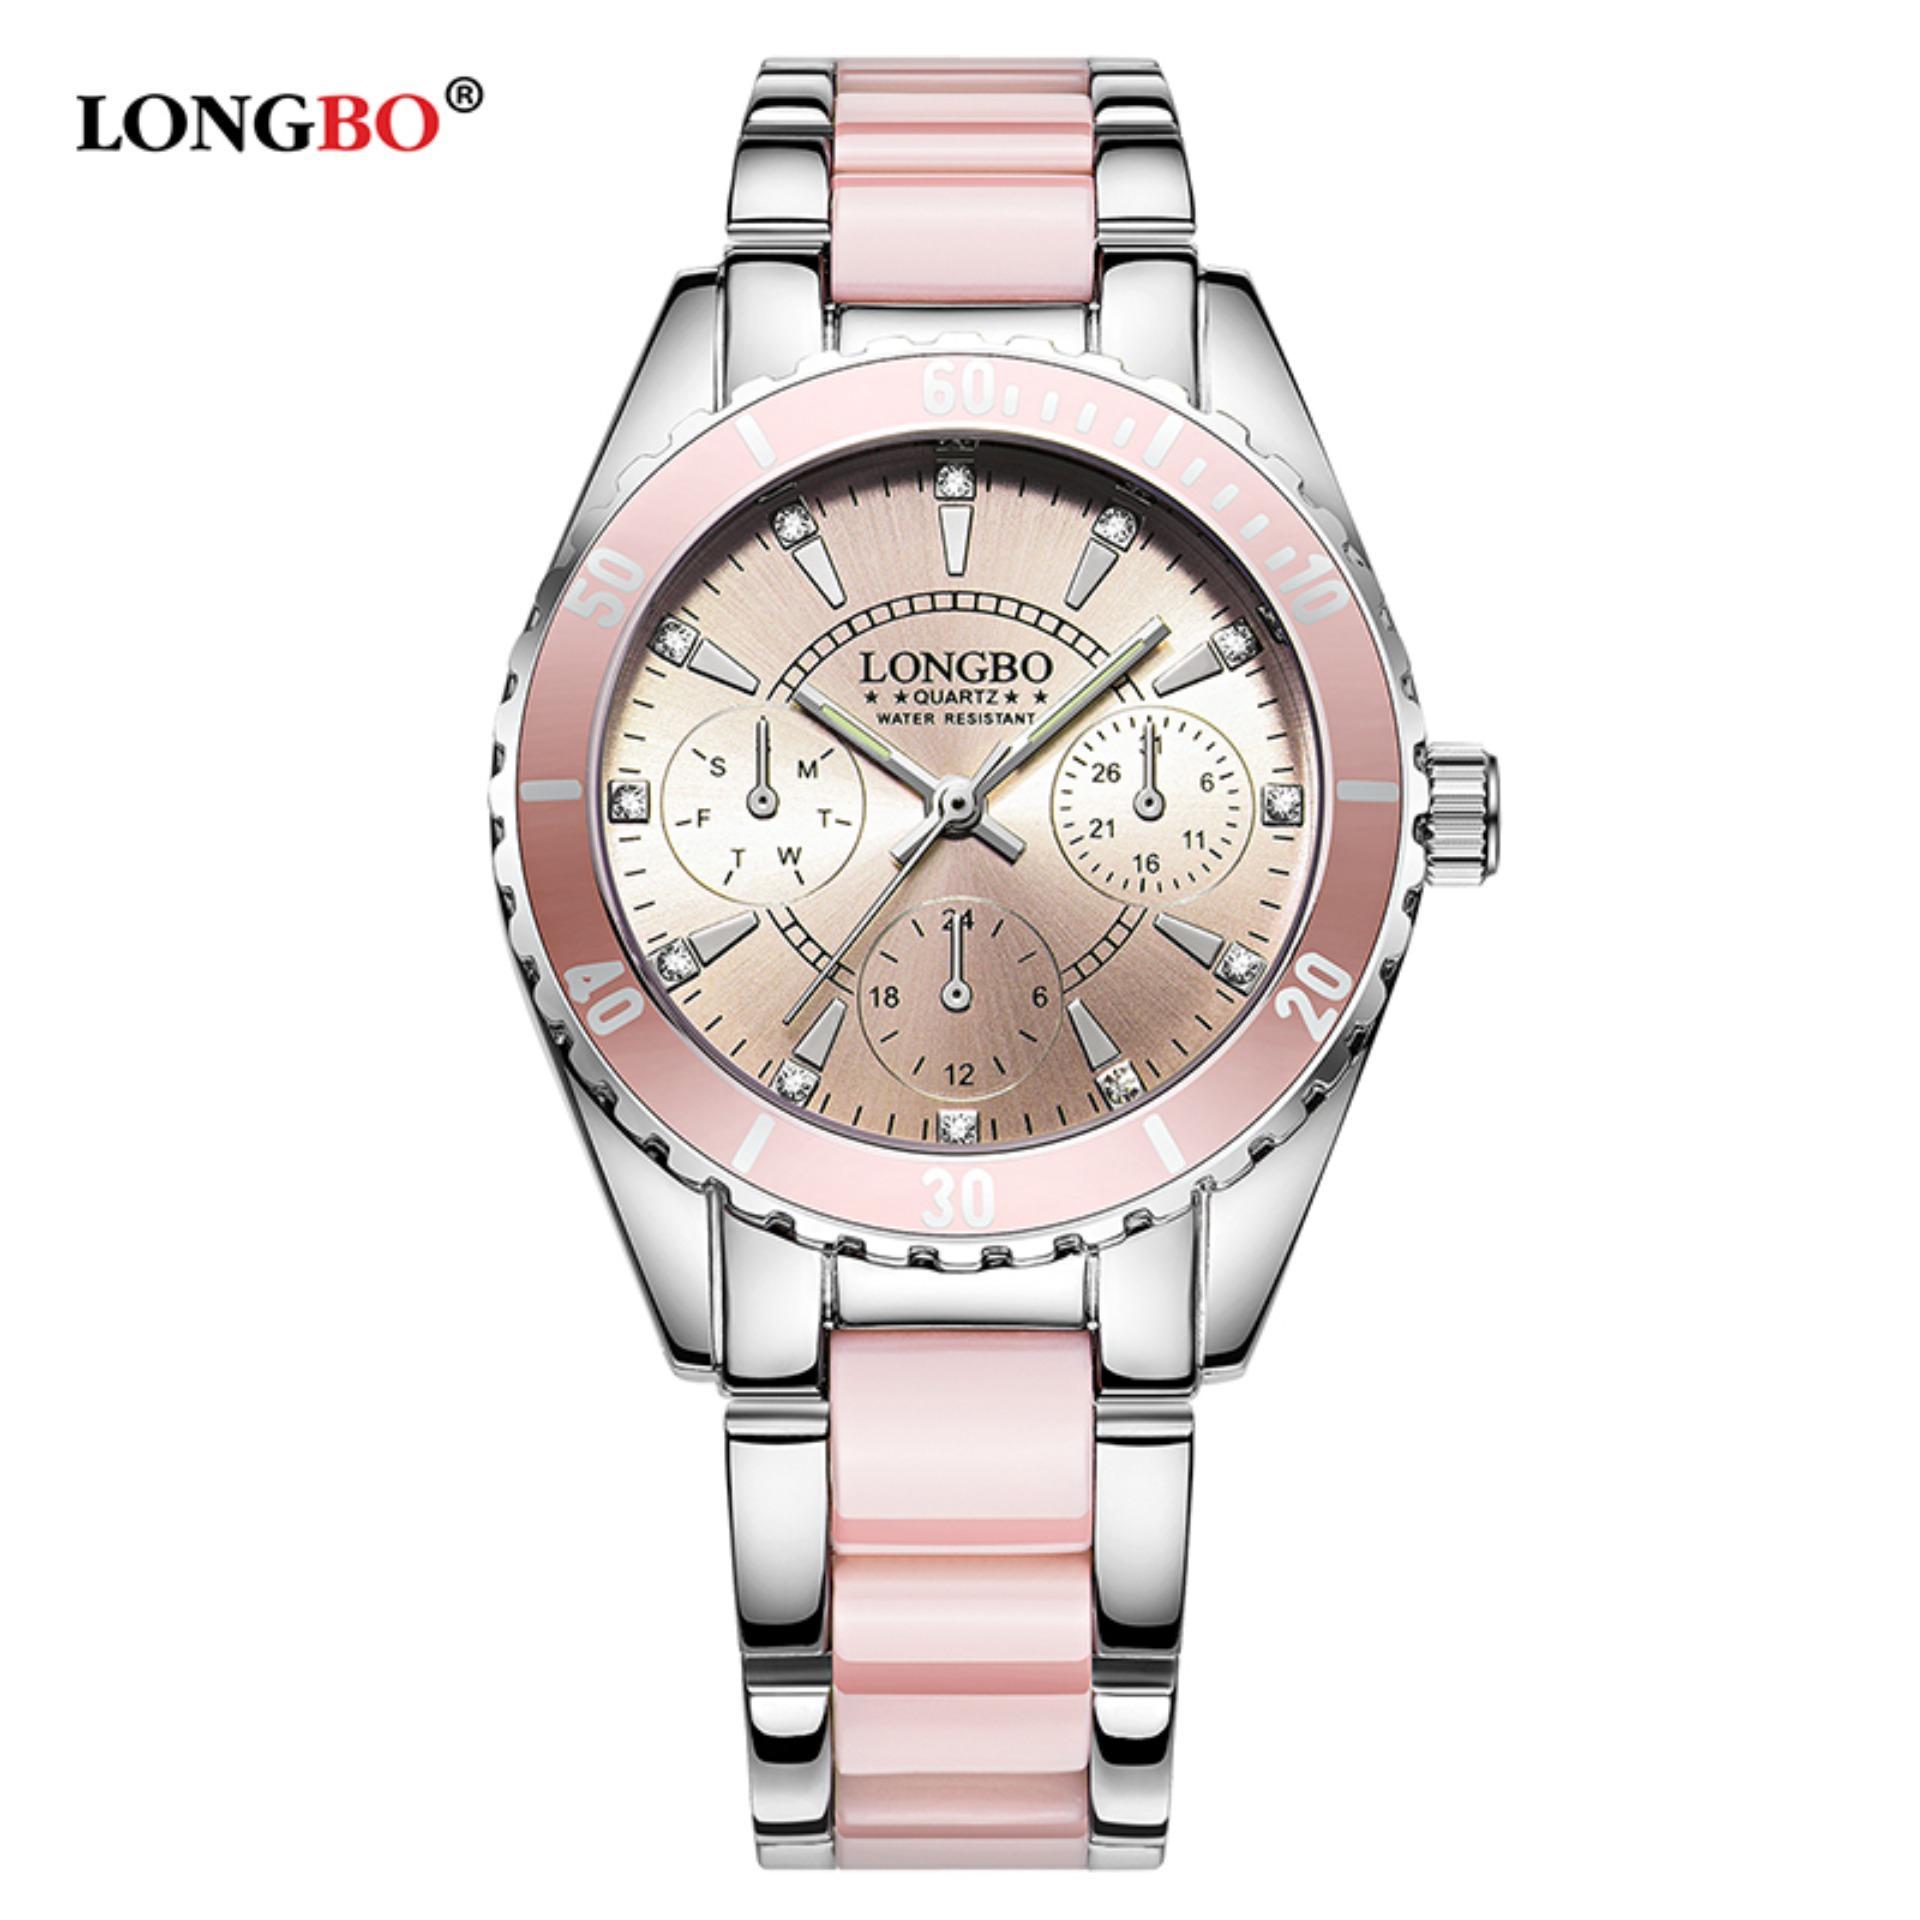 LONGBO Fashion Kasual Keramik Watchband Kasual Anolog Wanita Wanita Cewek Lihat Jam Tangan 80303L-Intl